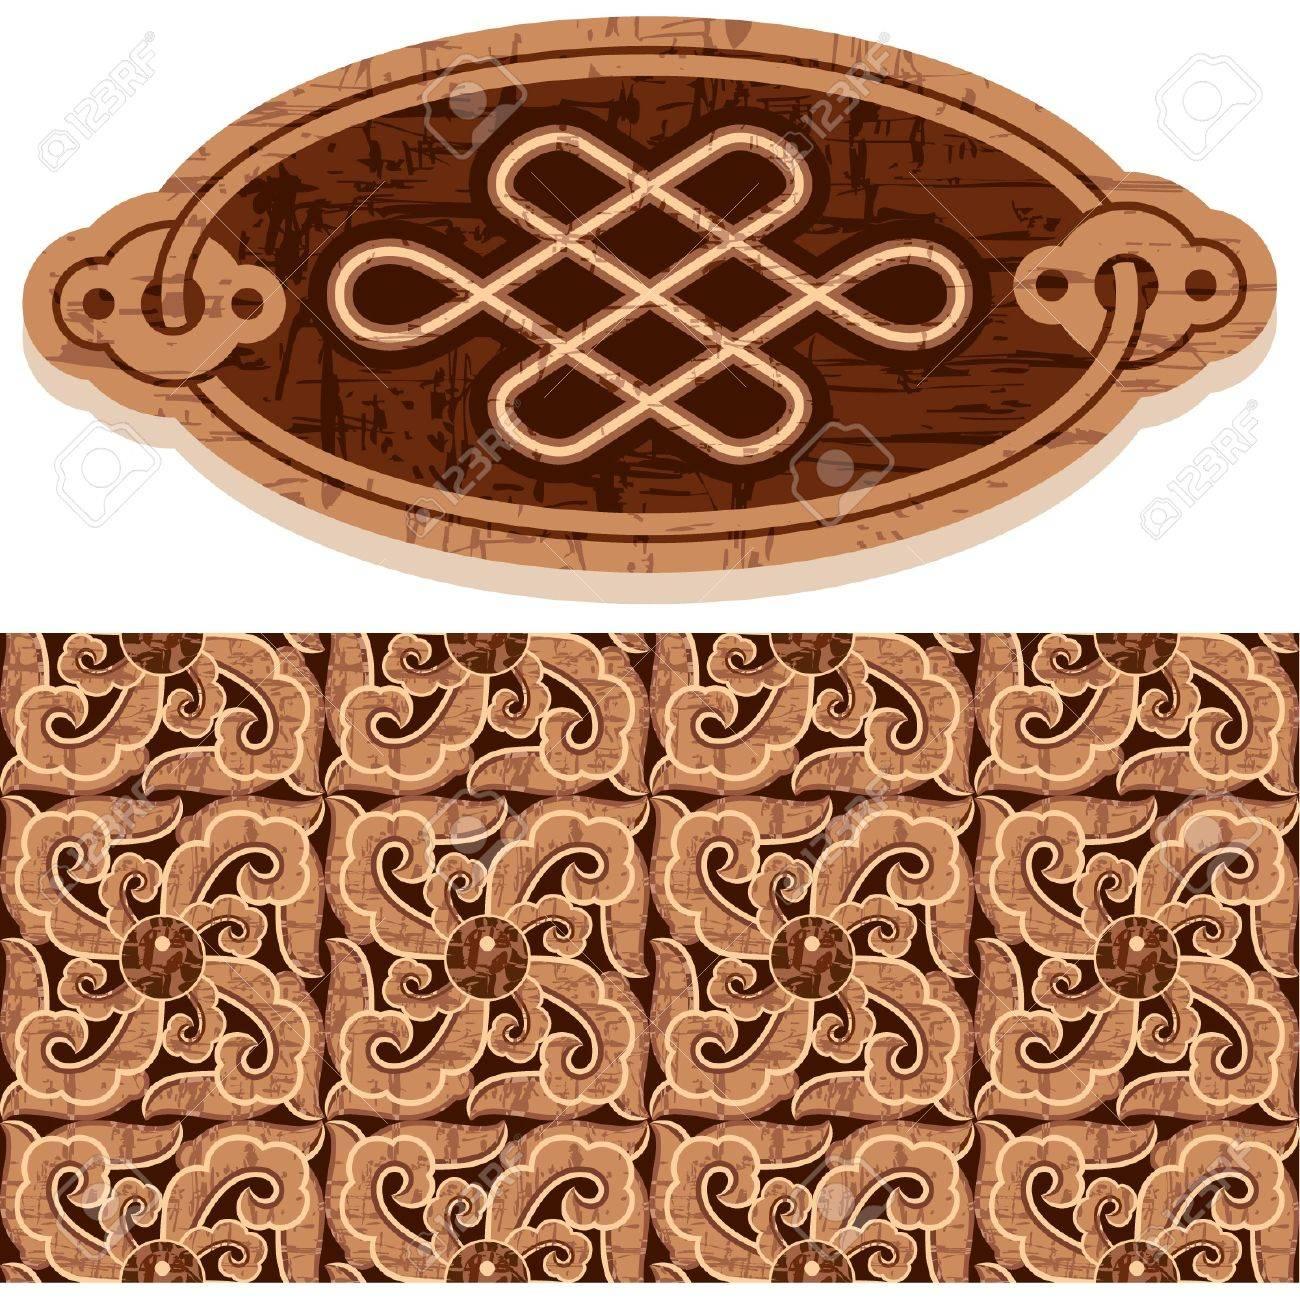 Oriental Ornament Decoration (grunge vintage woodcut) Stock Vector - 11113842